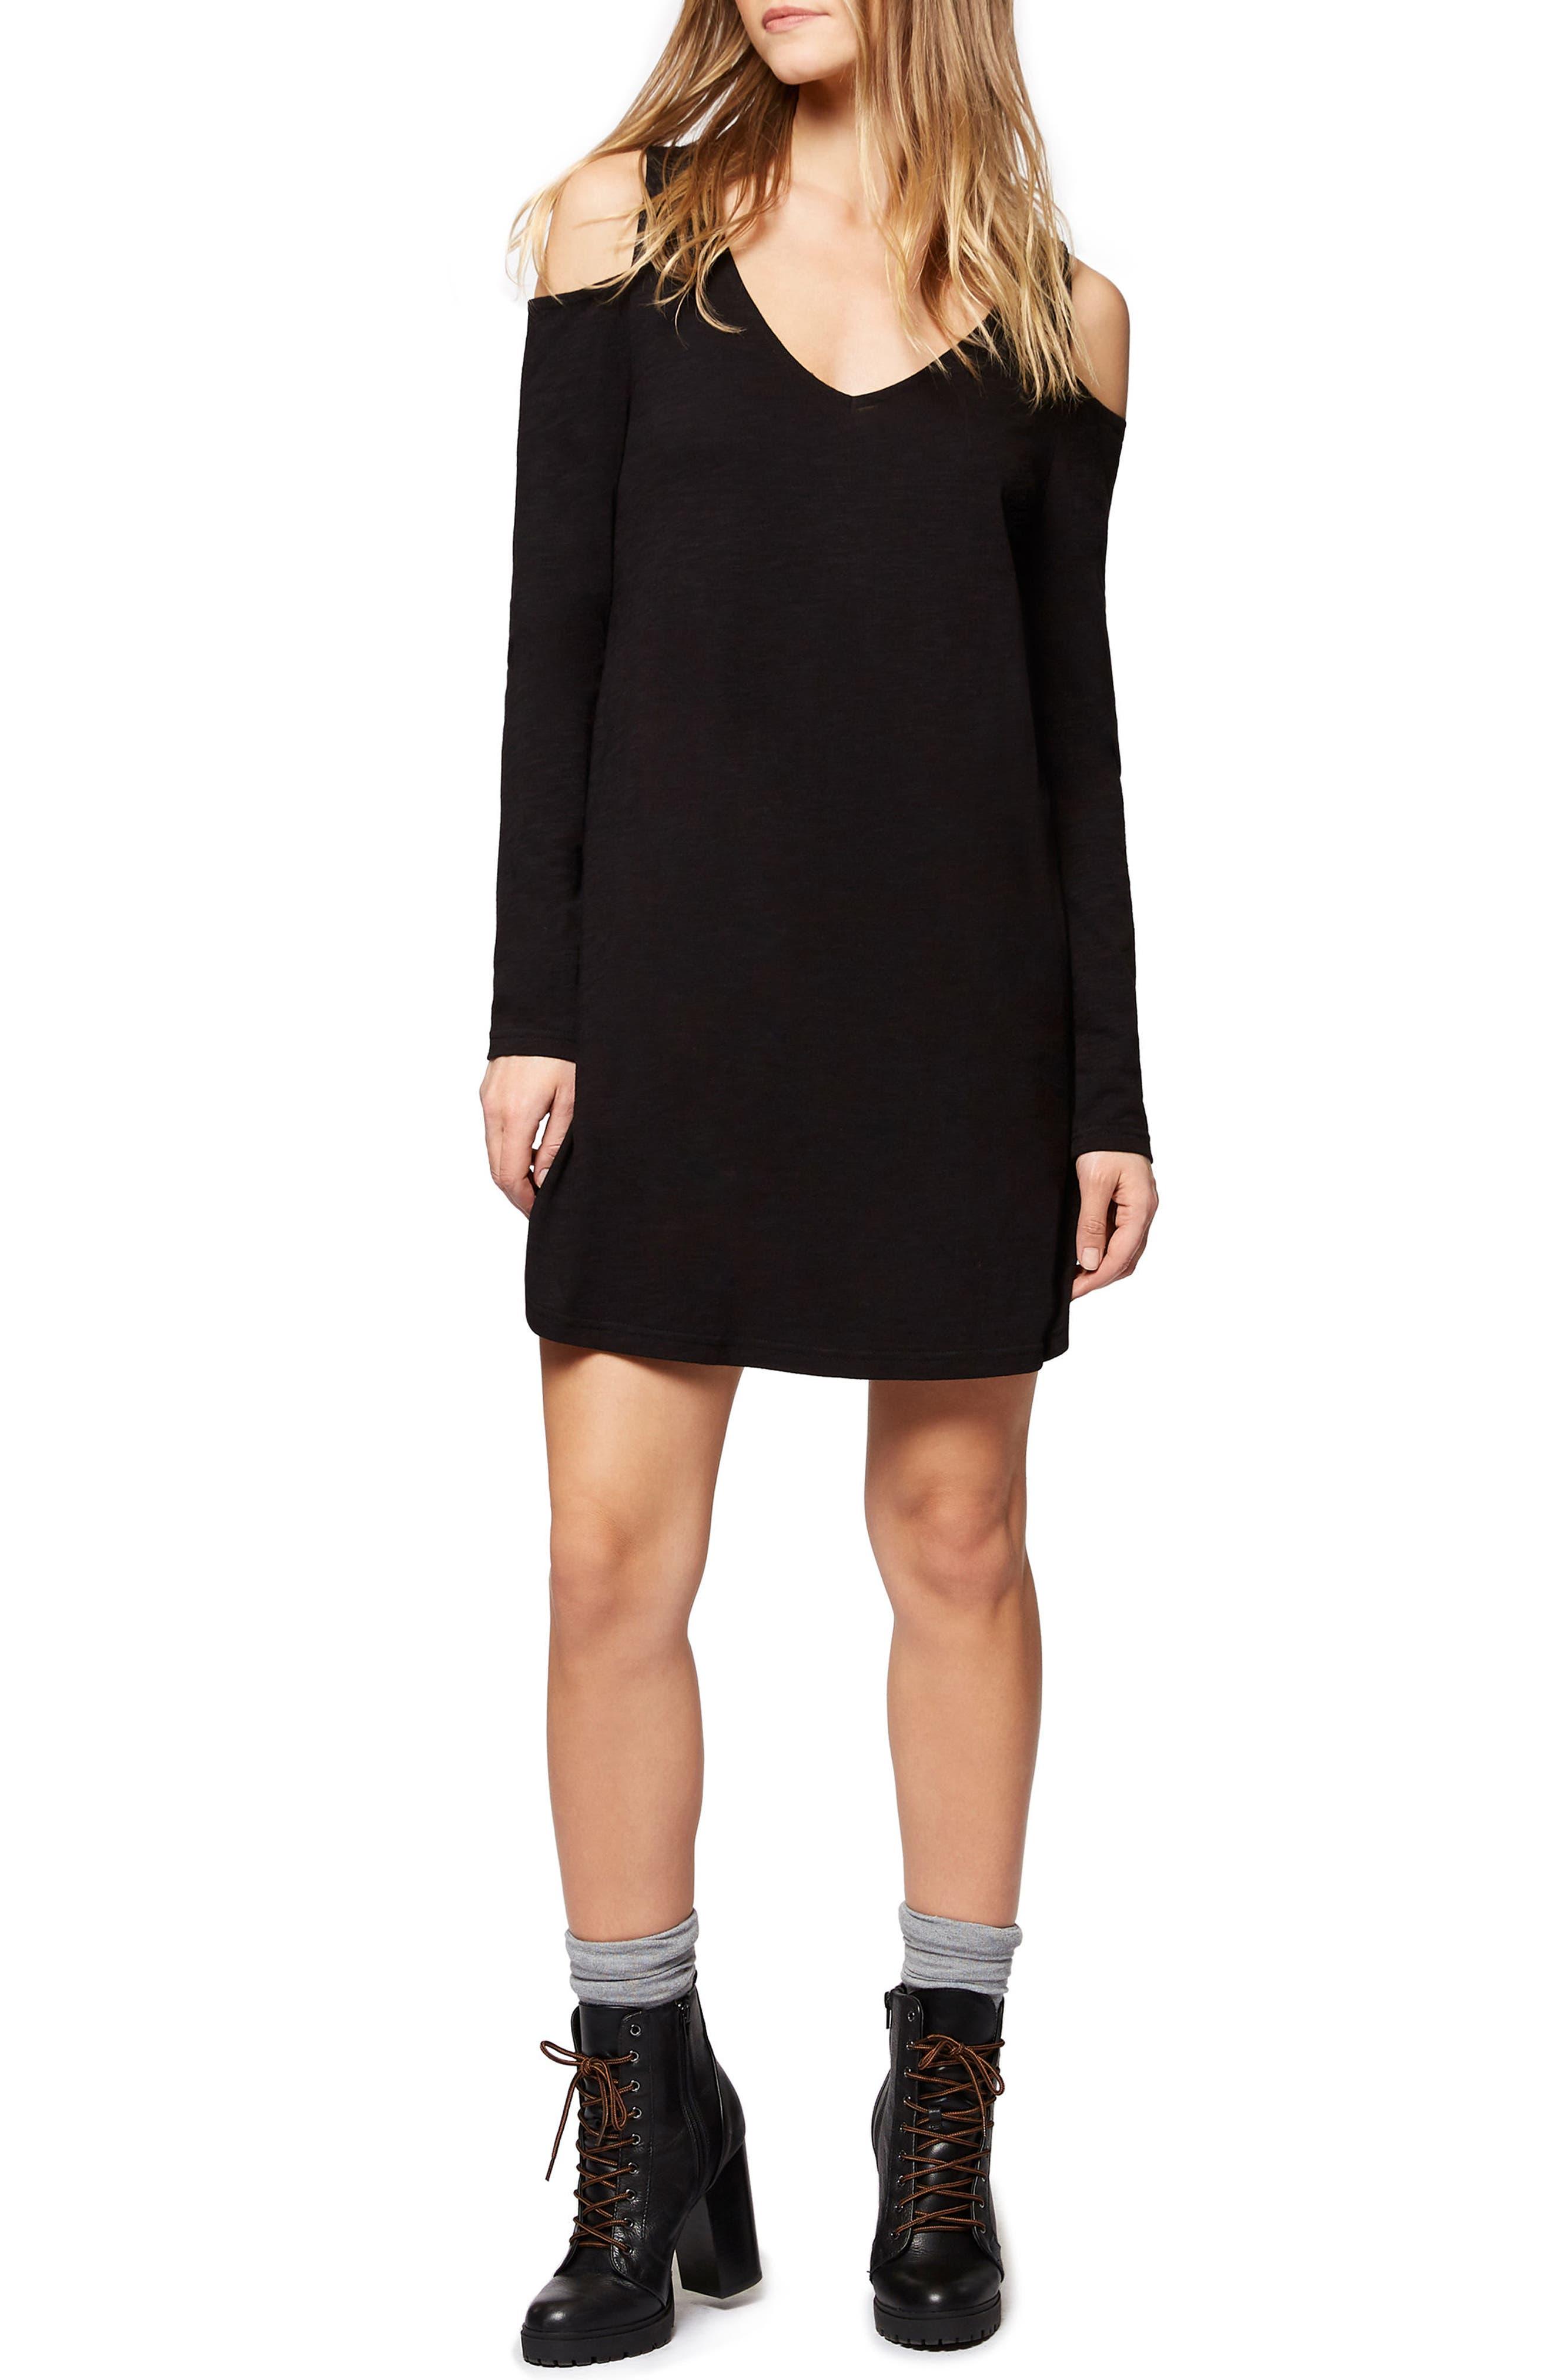 Alternate Image 1 Selected - Sanctuary Morgan Cold Shoulder T-Shirt Dress